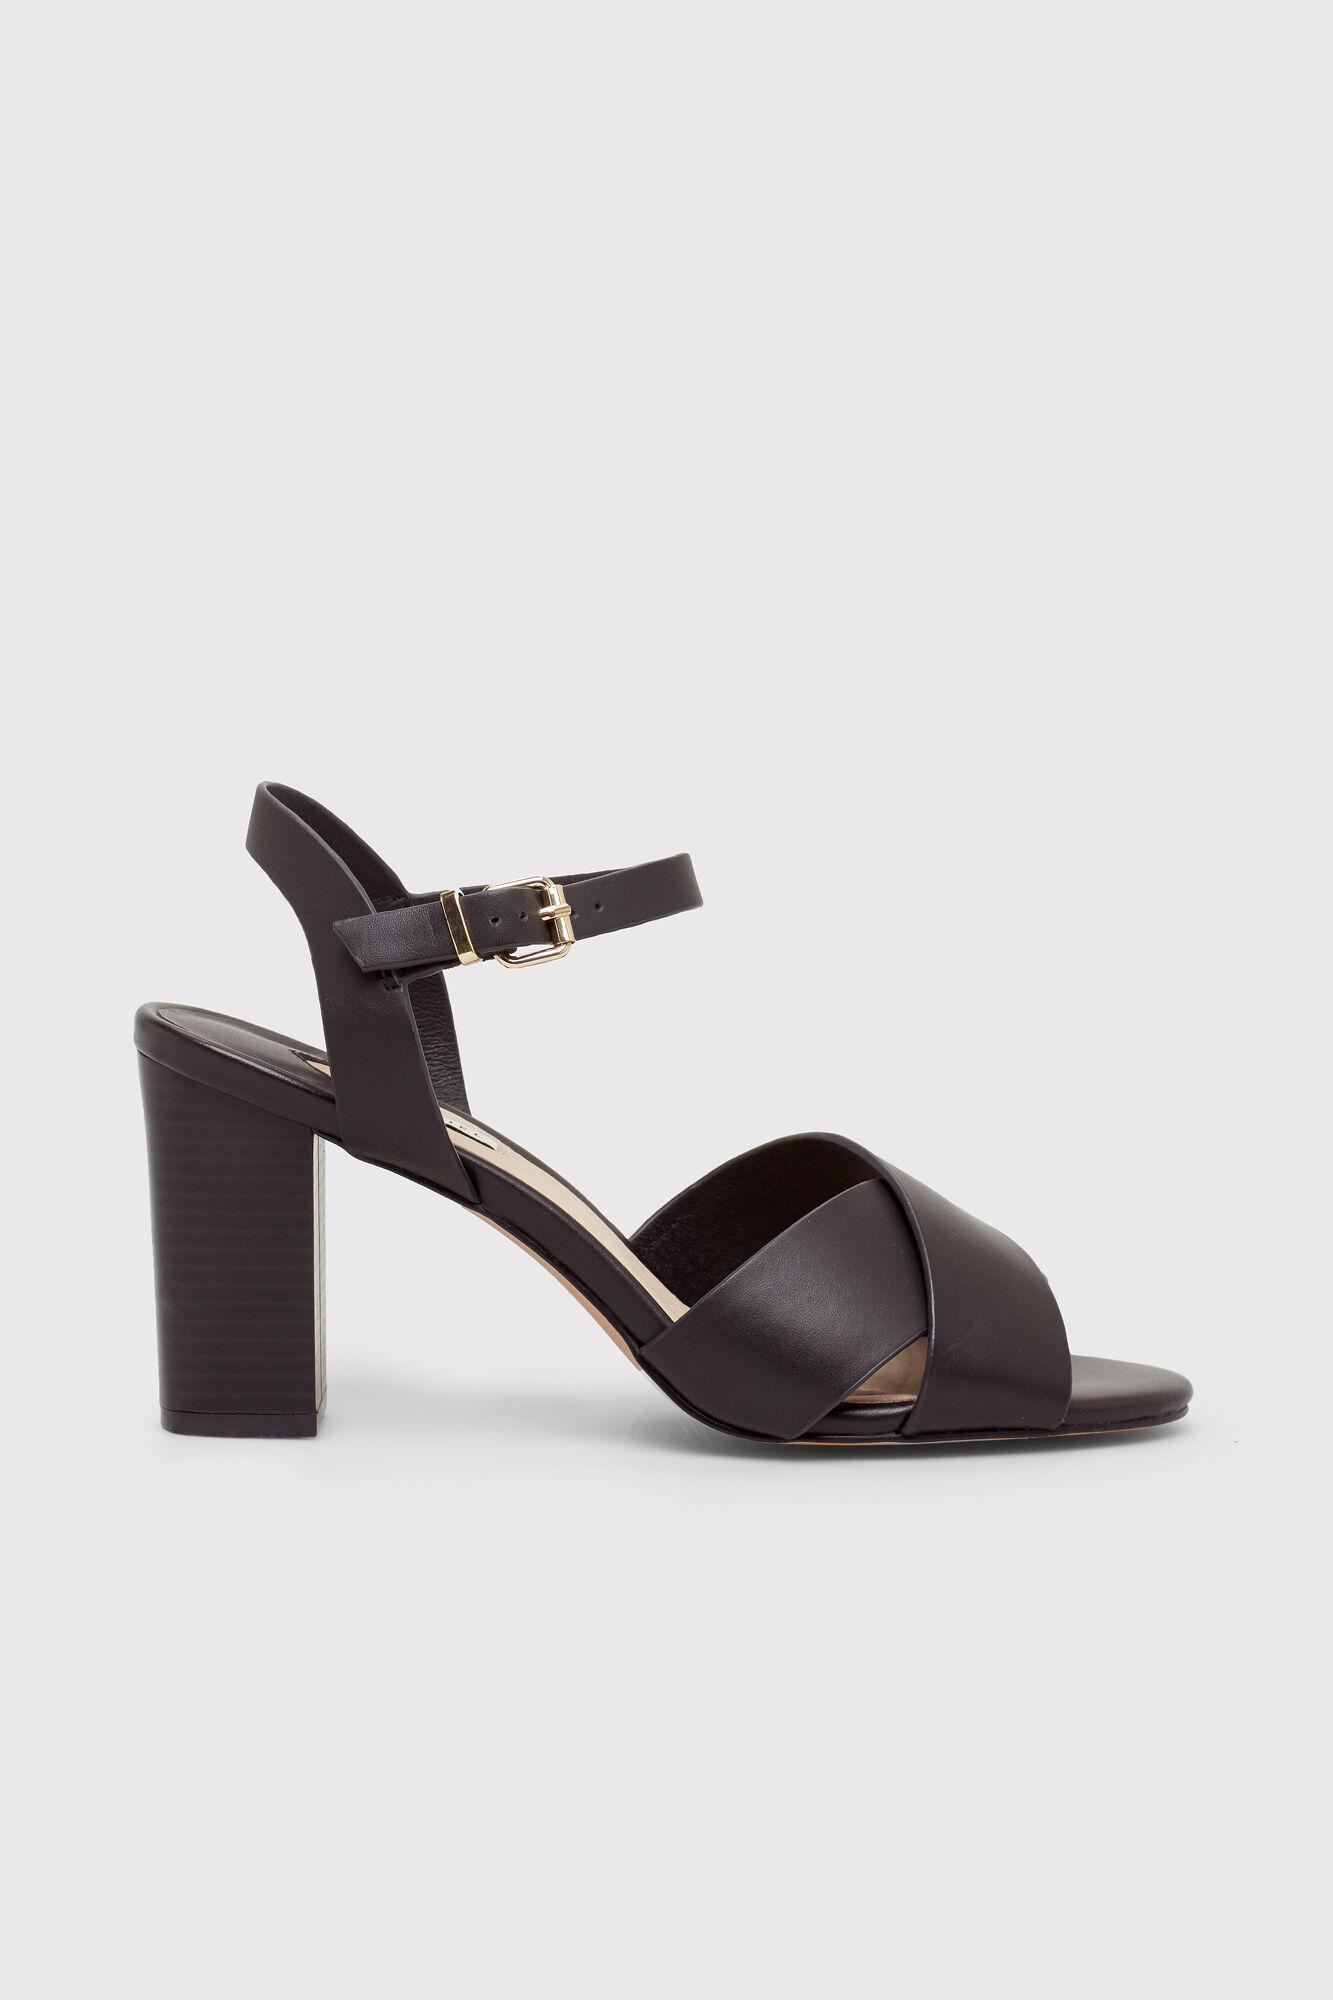 Zapatos Mujer Fifty Zapatos De Zapatos Mujer Fifty Outlet Fifty Outlet Mujer De Outlet De ASOwE7gq